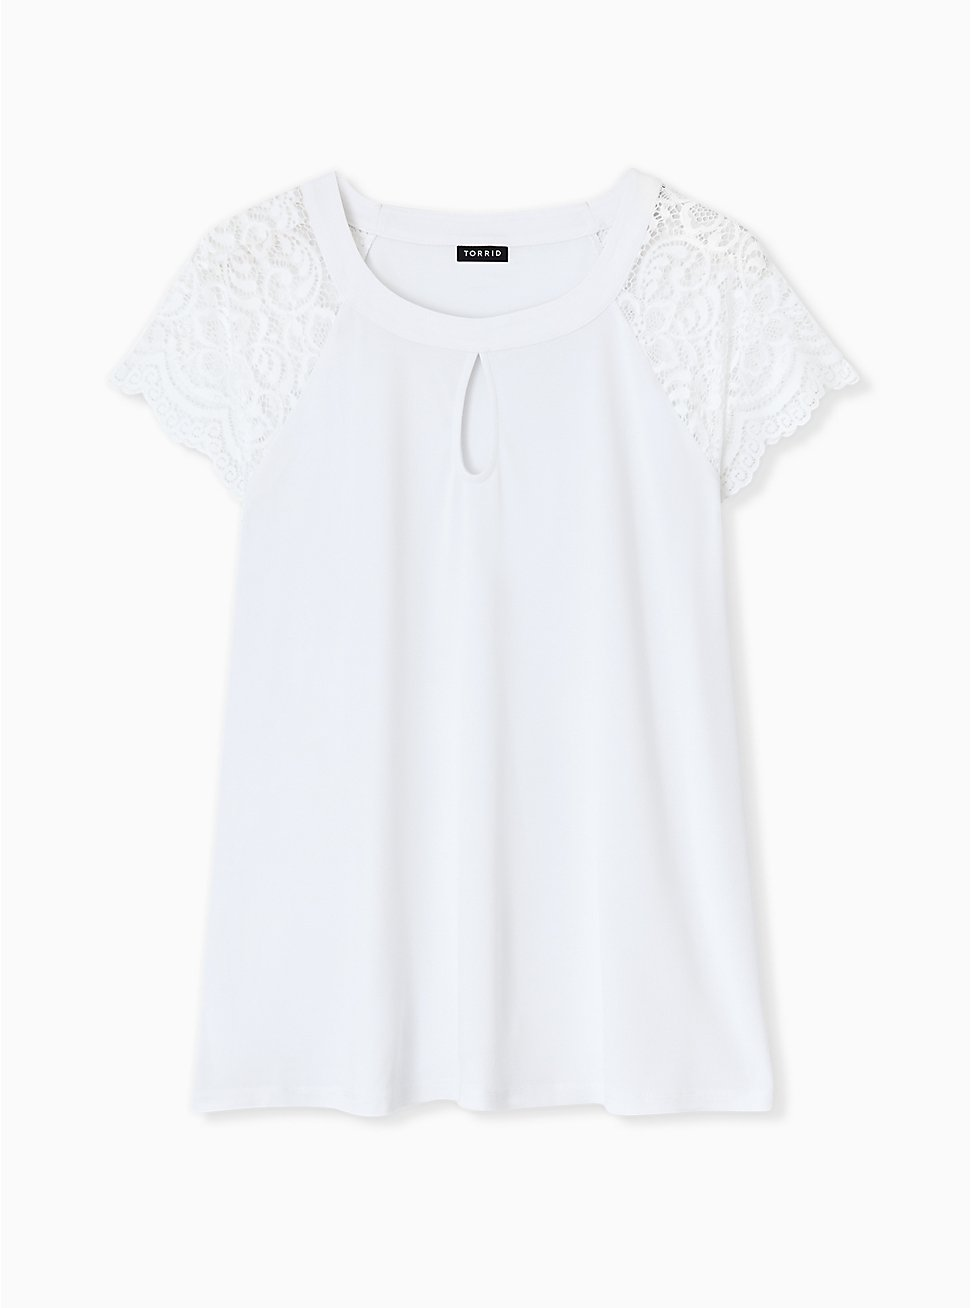 Plus Size White Studio Knit Lace Sleeve Top, BRIGHT WHITE, hi-res